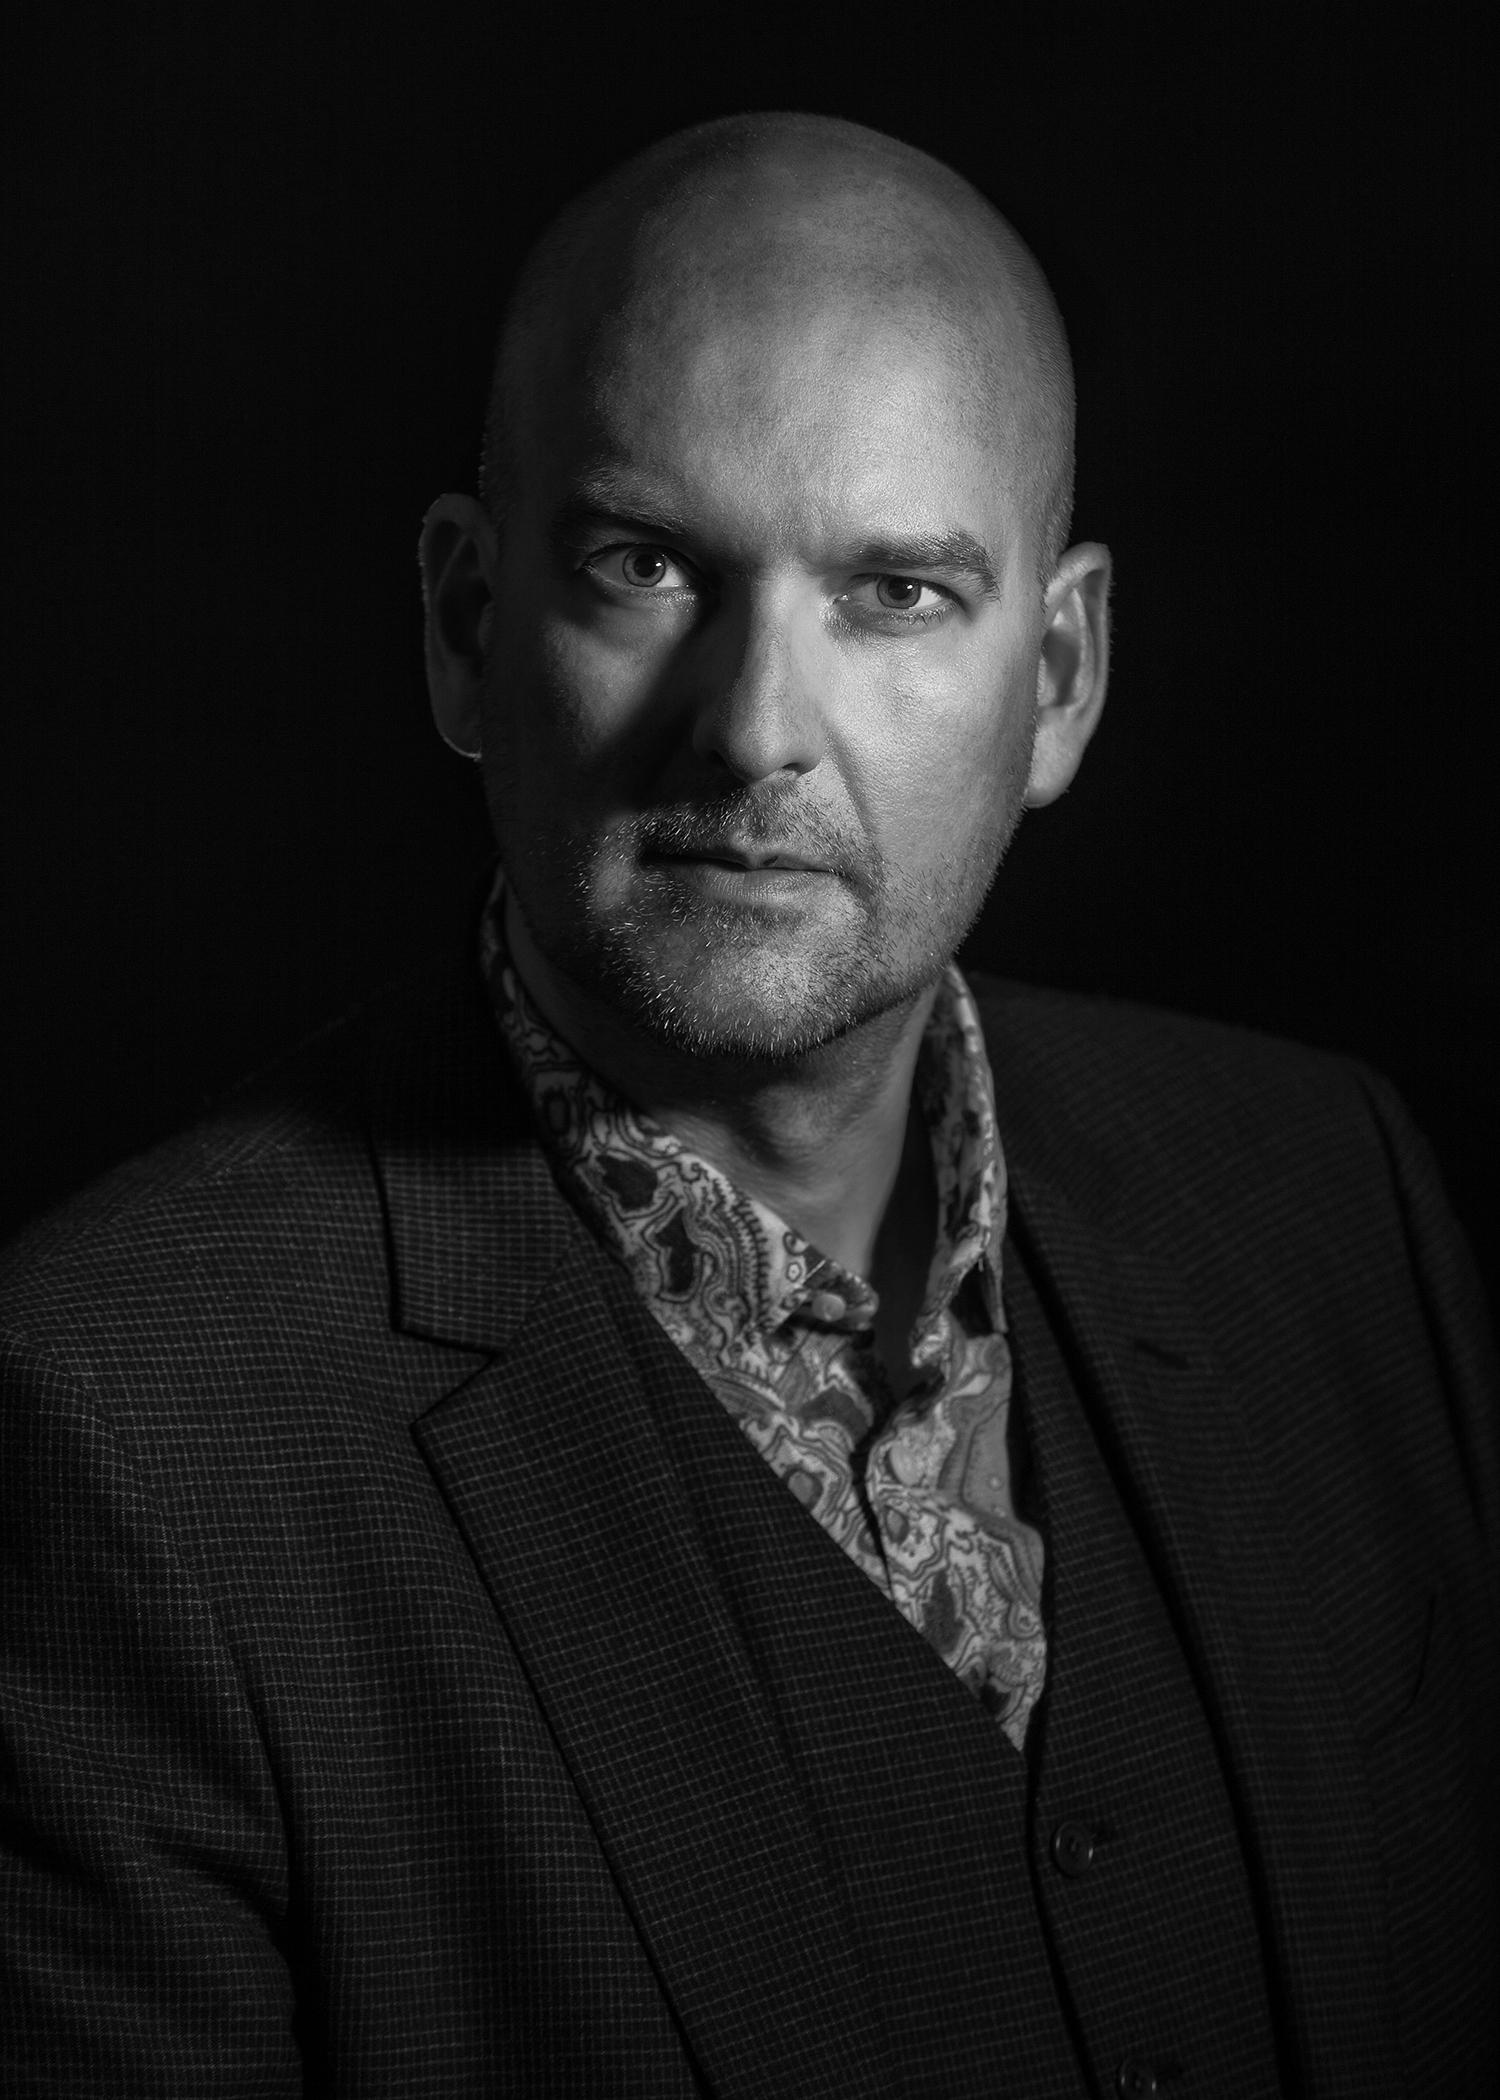 Matthias Göritz